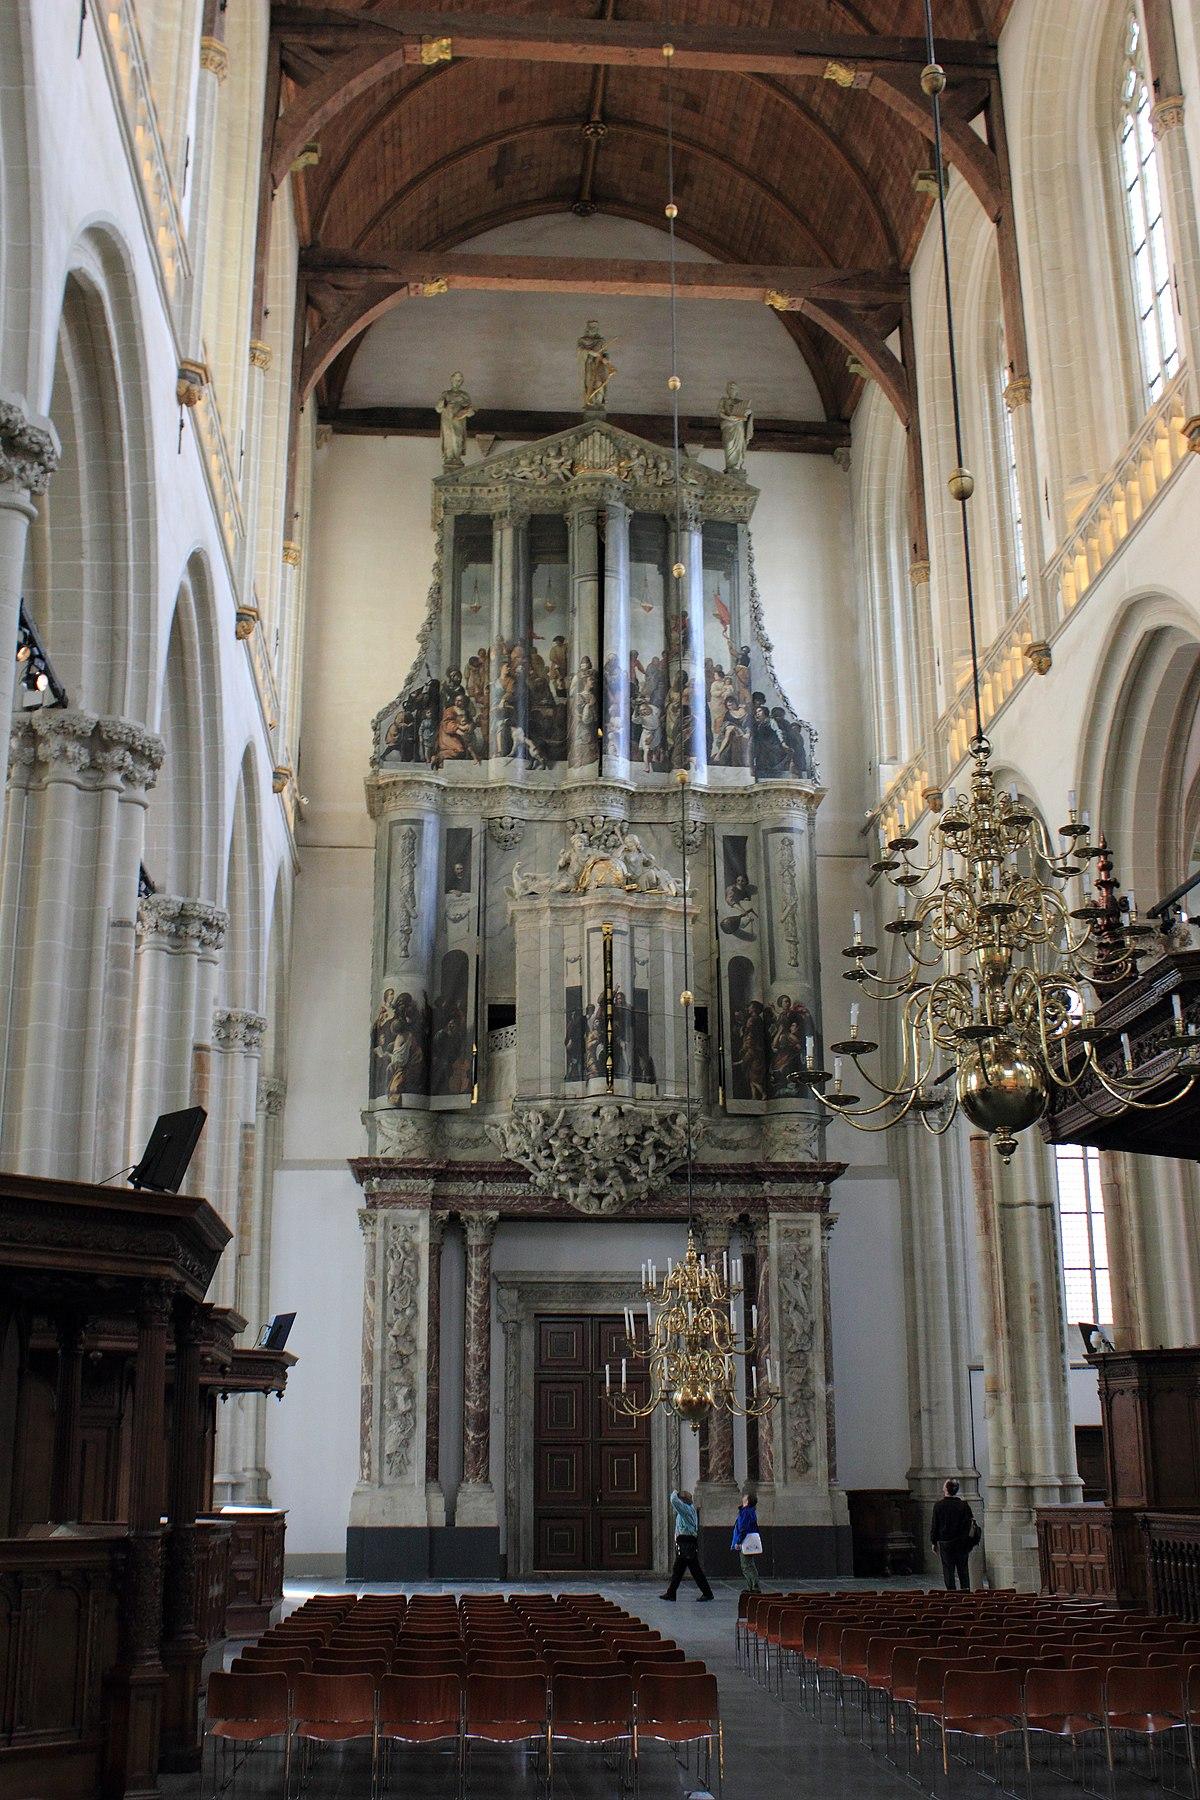 orgels van de nieuwe kerk amsterdam wikipedia. Black Bedroom Furniture Sets. Home Design Ideas